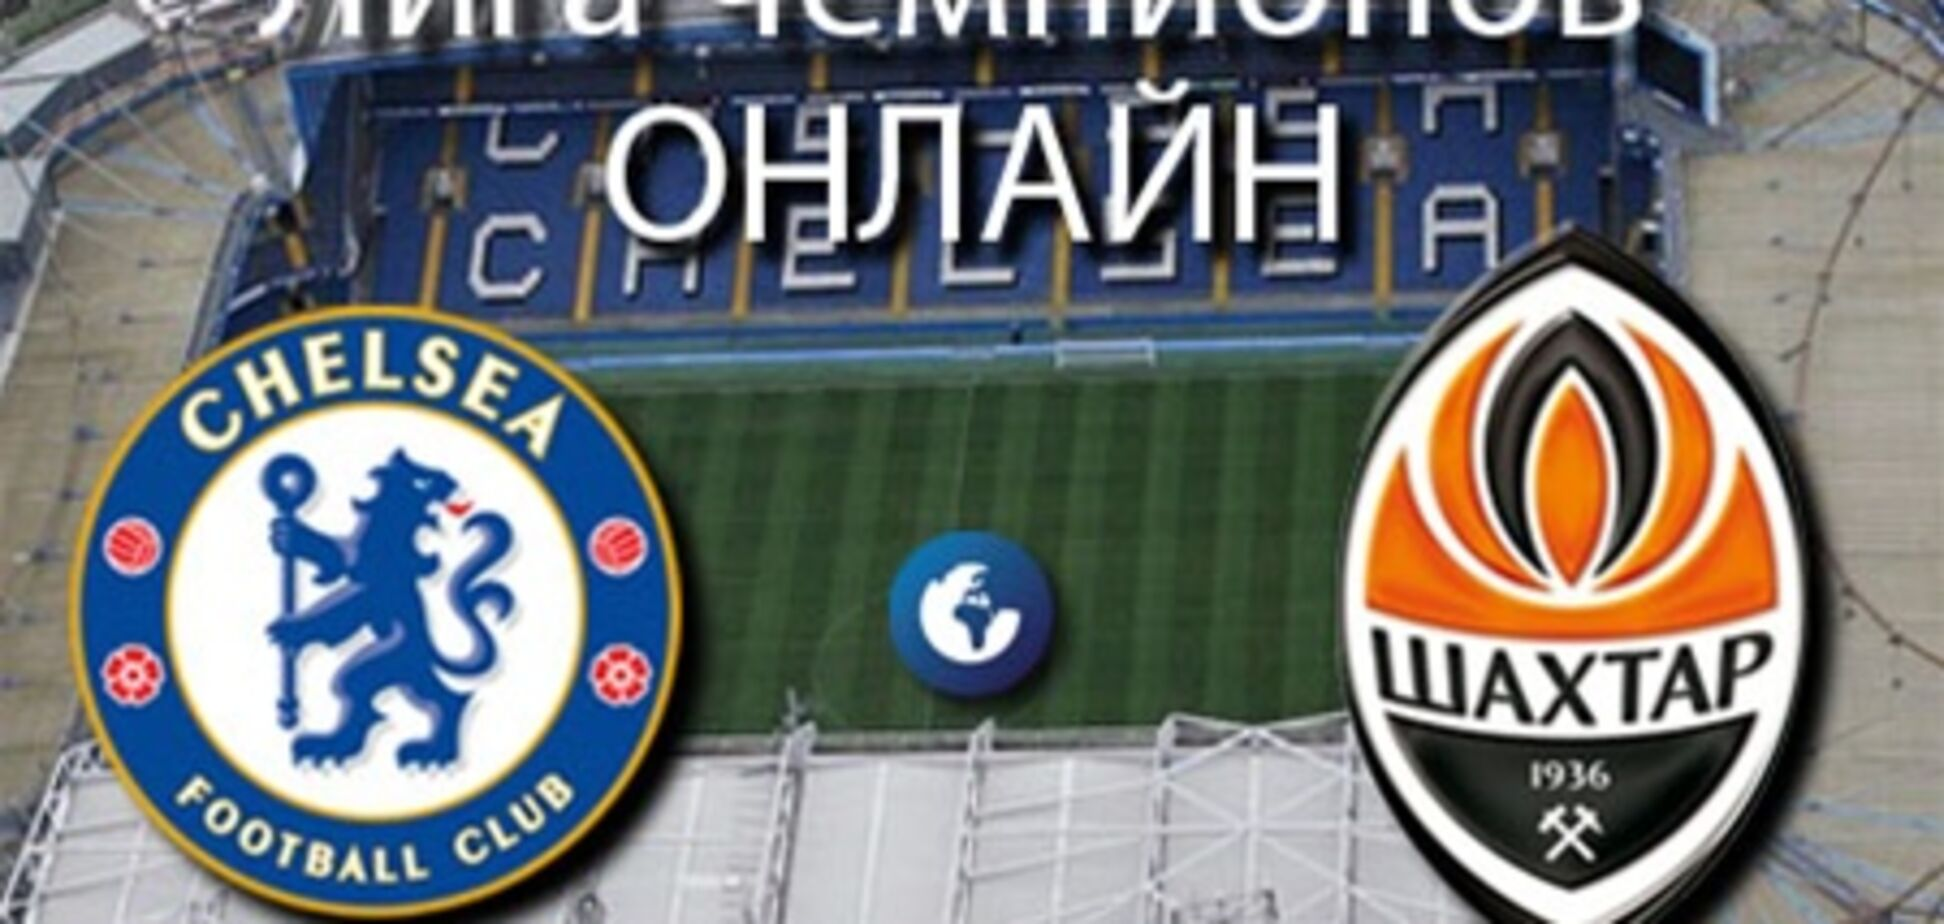 'Челси' - 'Шахтер' - 3:2. Хронология матча и видео голов